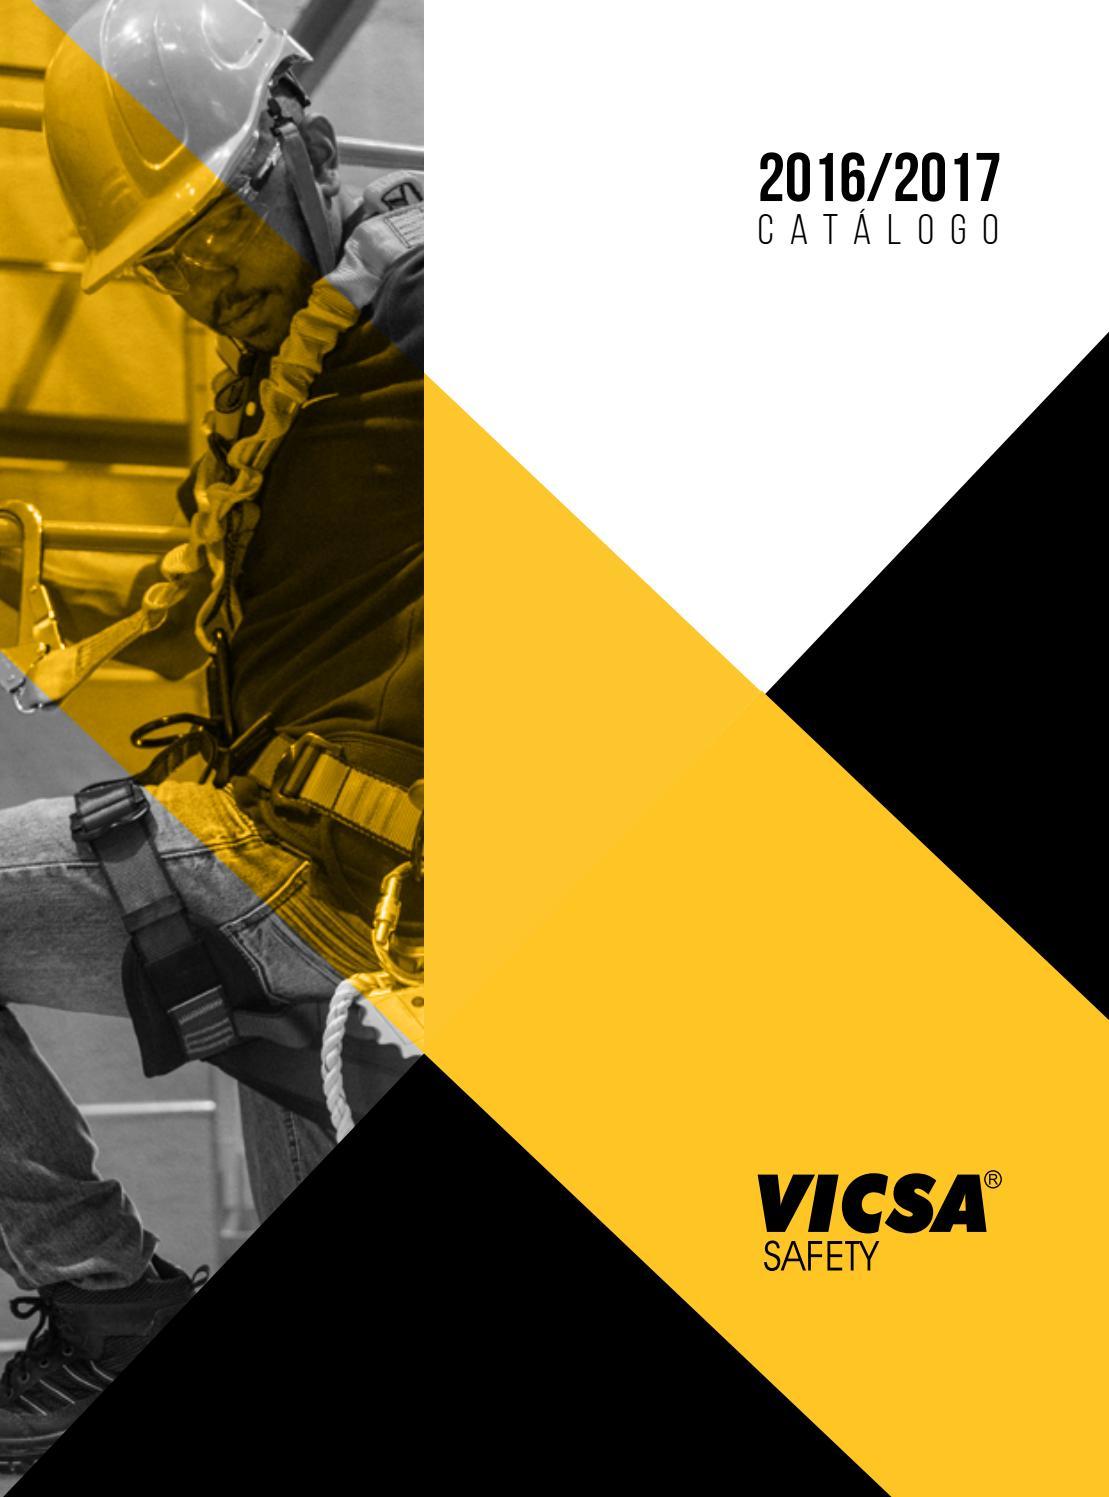 cat193logo vicsa 2016 by vicsa safety brasil issuu